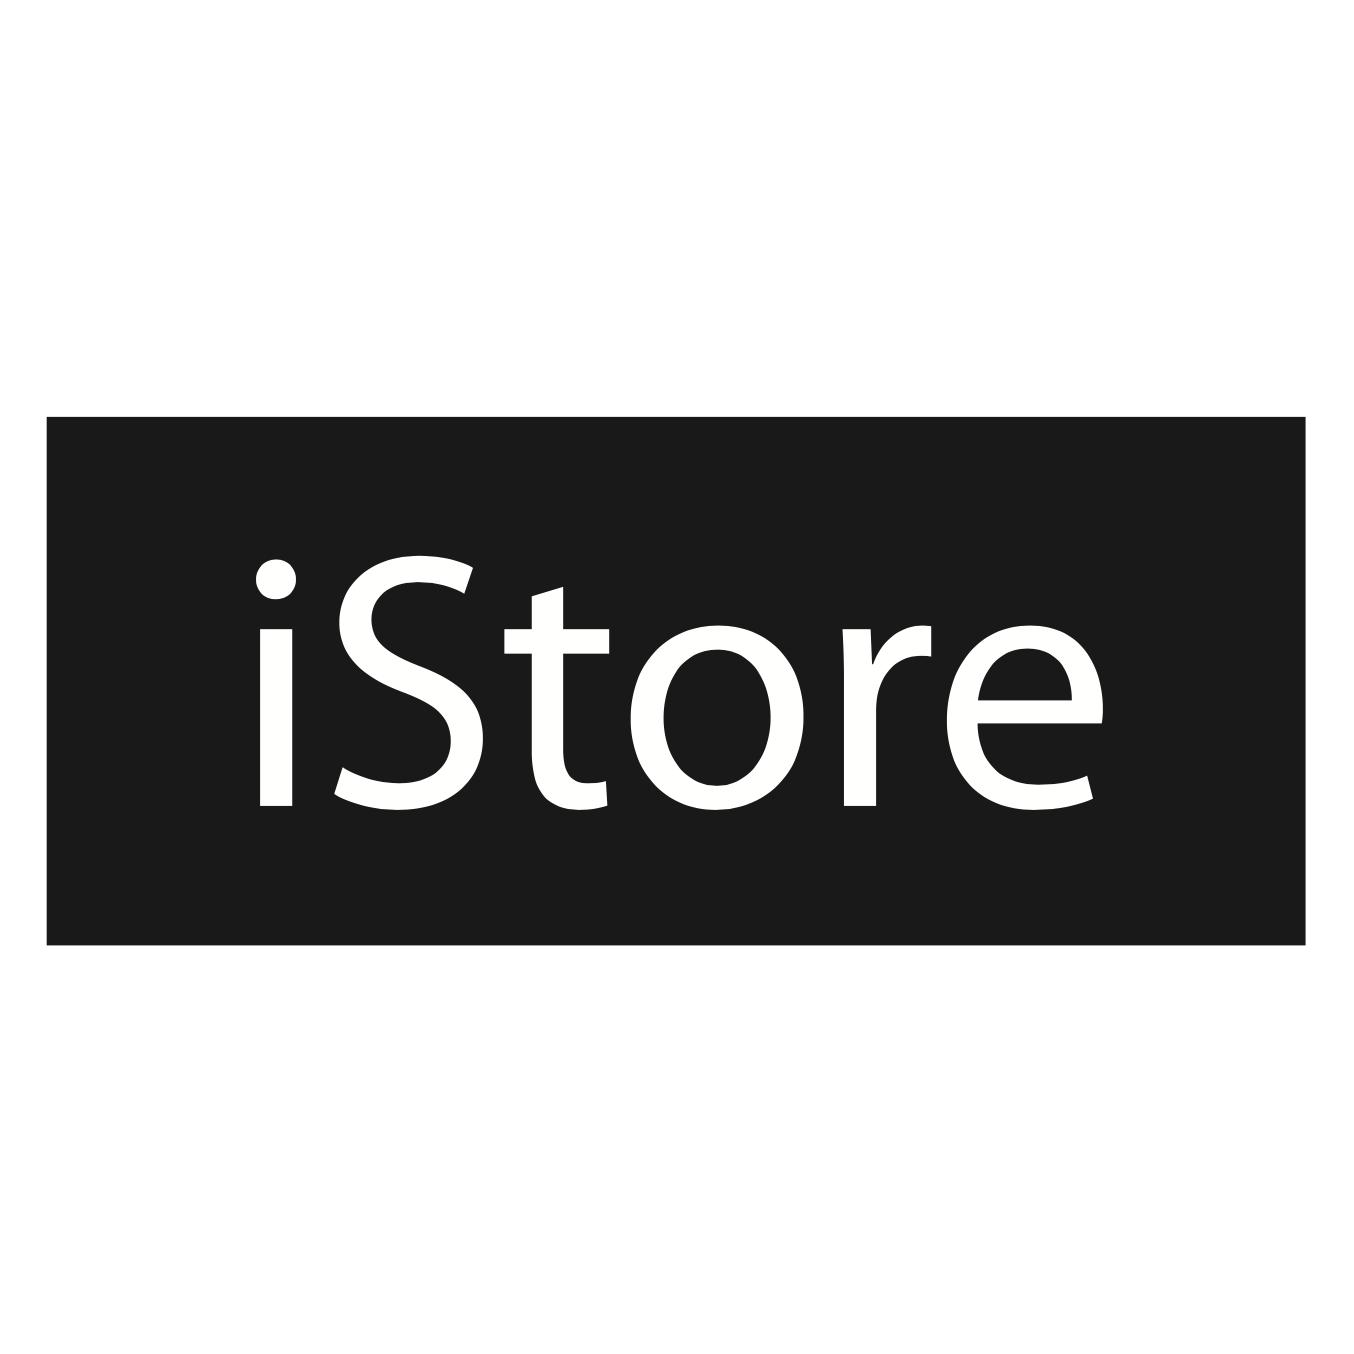 iPhone 6s Silicone Case - White